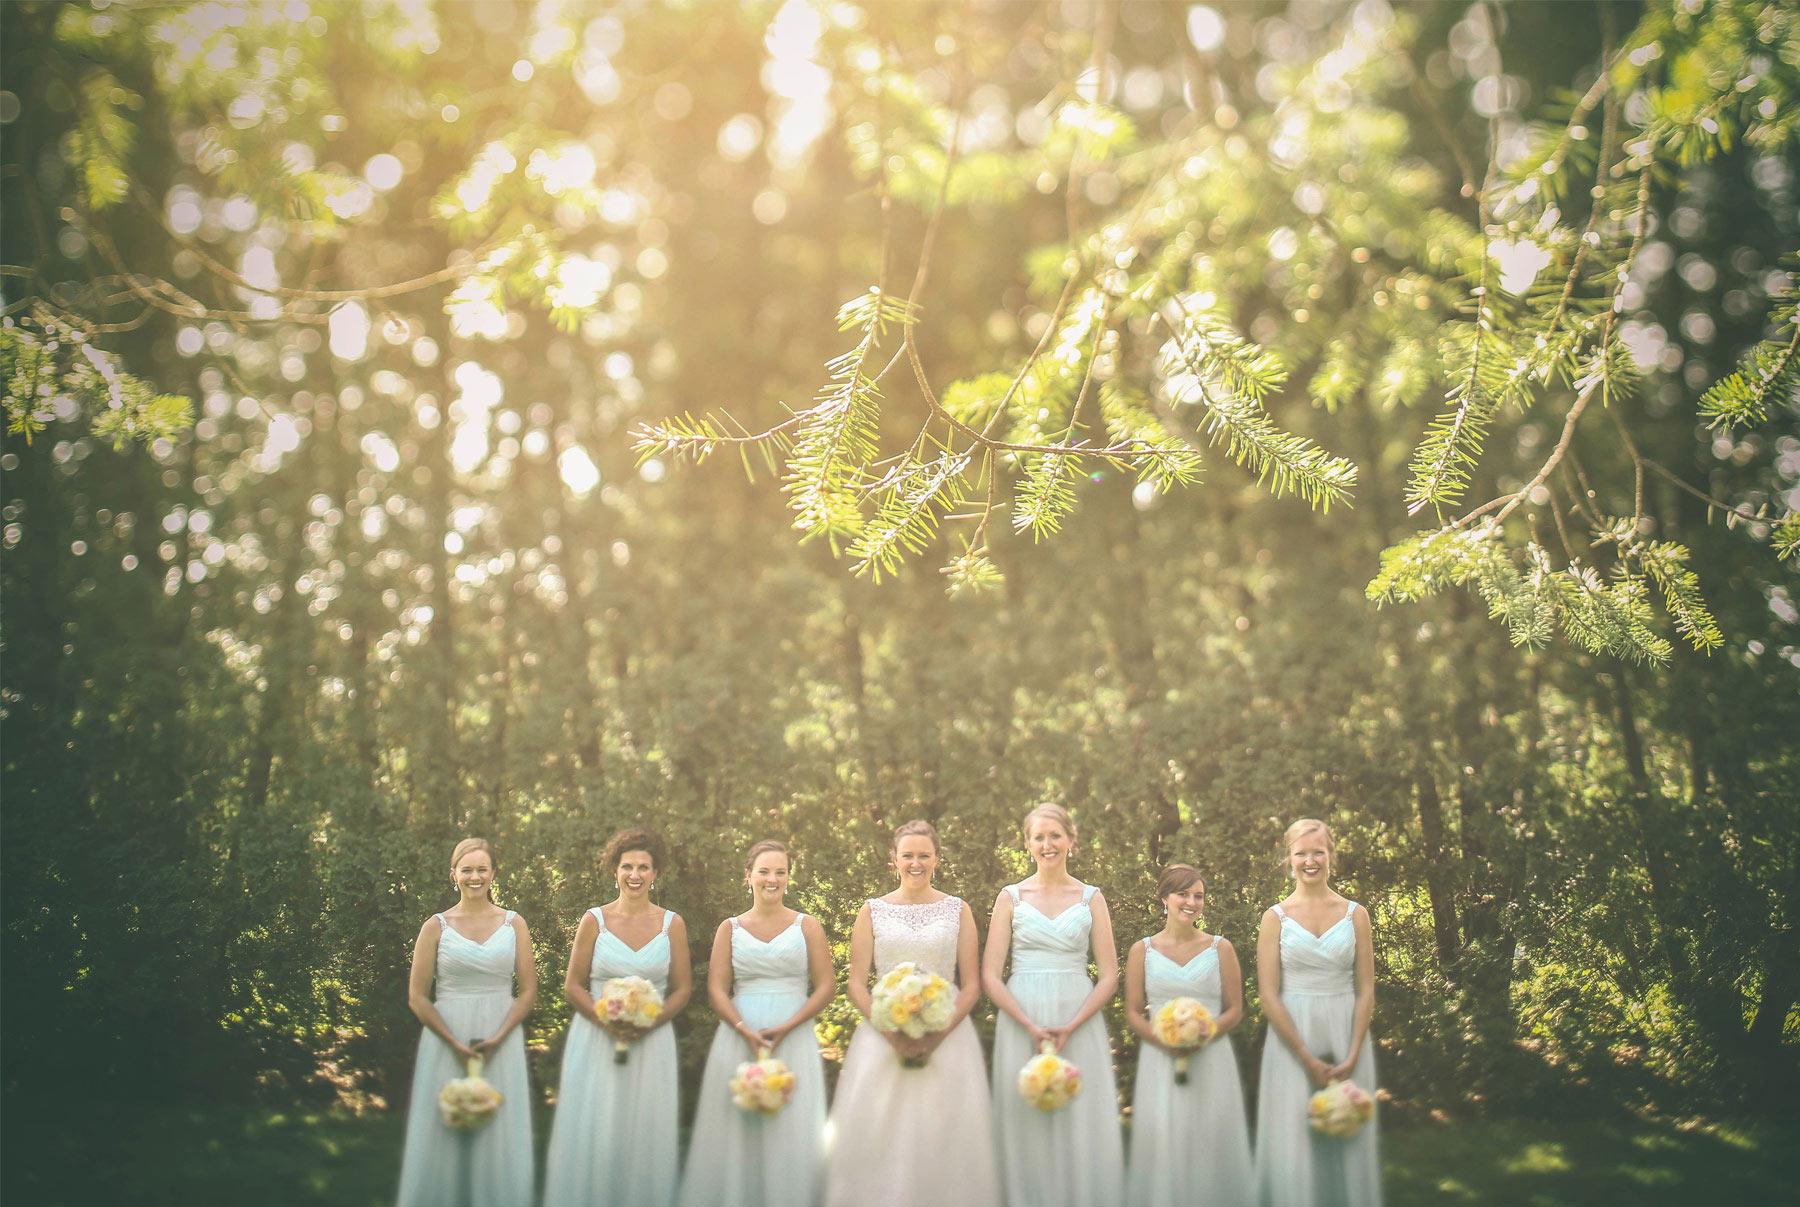 10-Minneapolis-Minnesota-Wedding-Photography-by-Vick-Photography-Edina-Wedding-Party-Bridesmaids-Grace-&-Nick.jpg